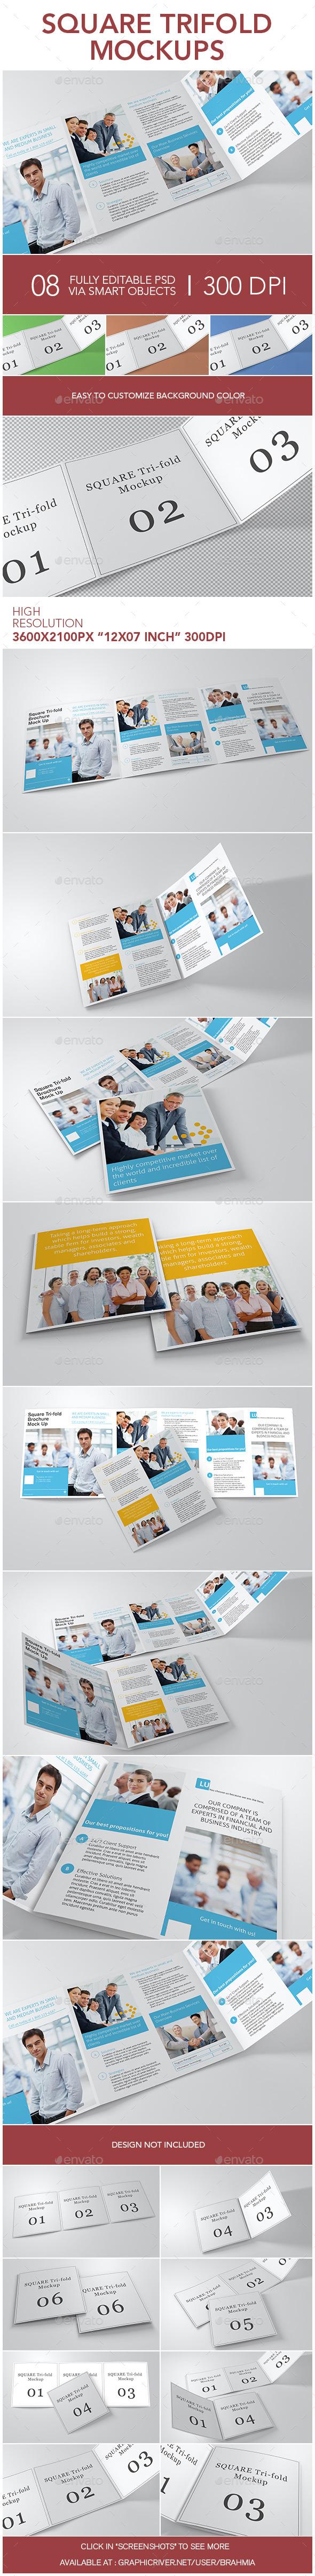 Square Trifold Mockups - Brochures Print